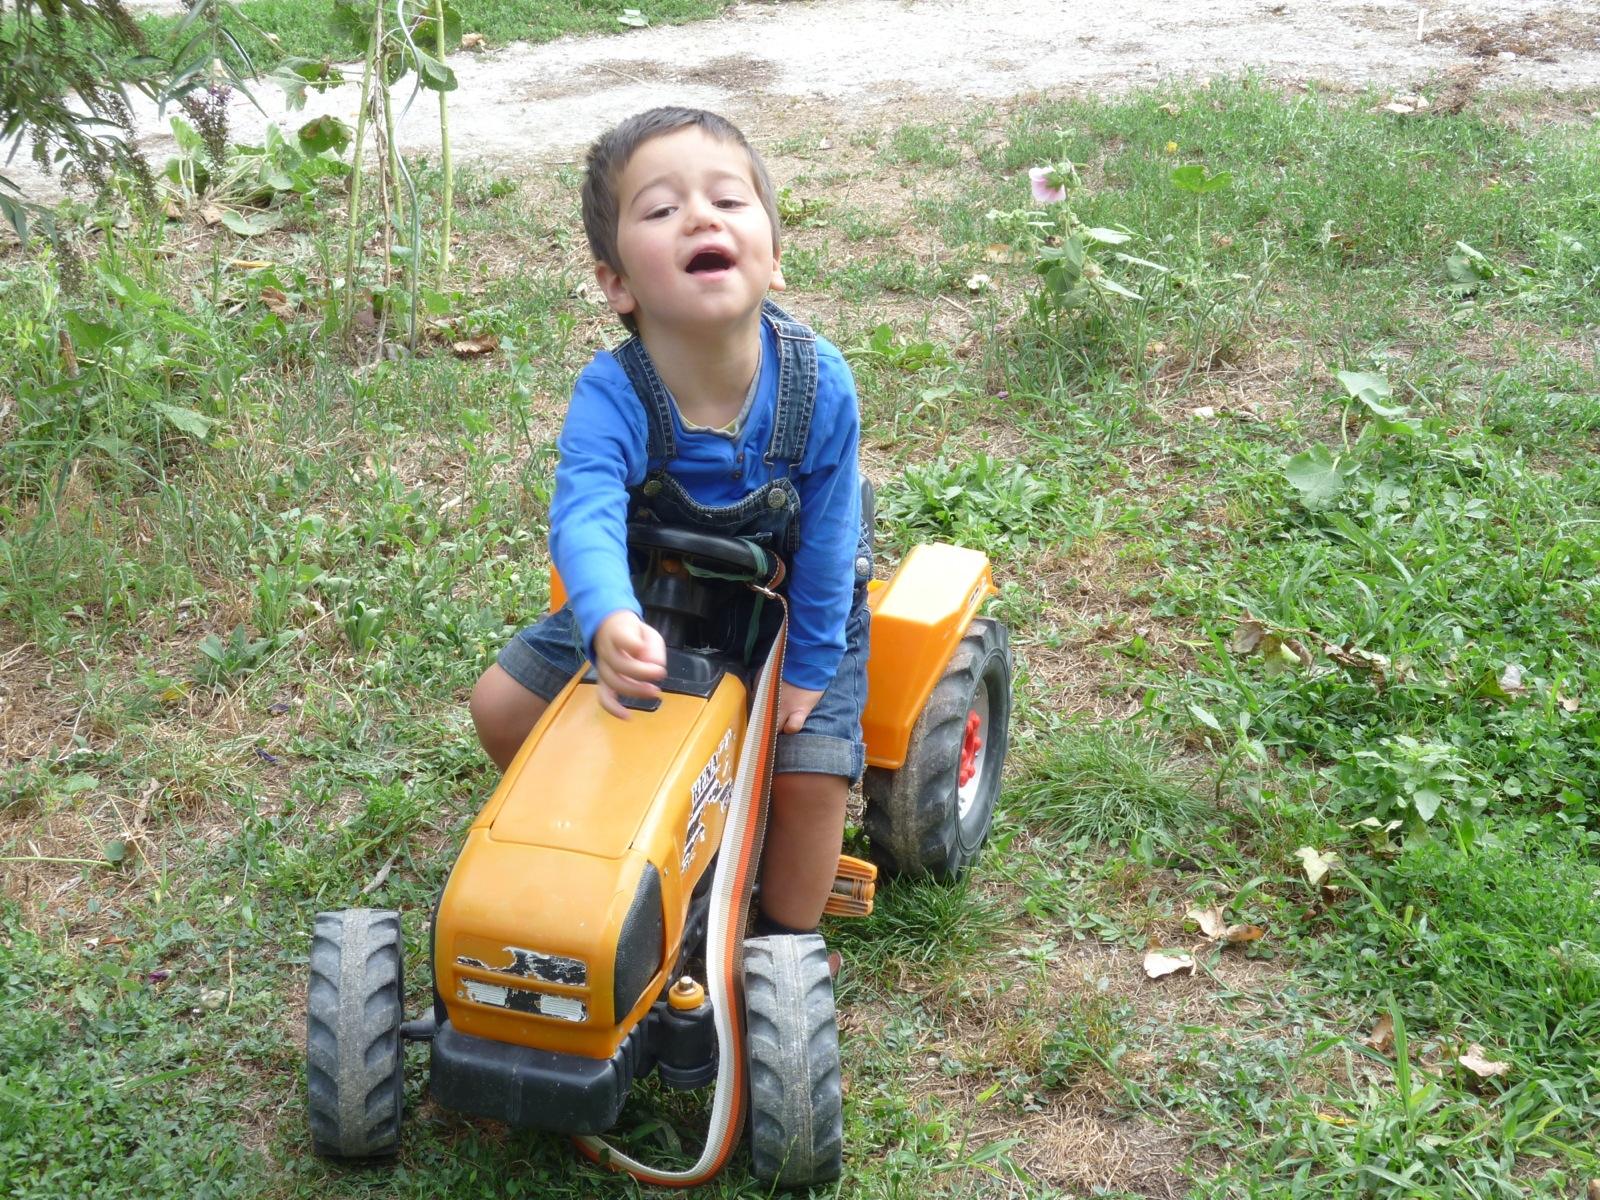 Soren est un petit garçon atteint de handicap